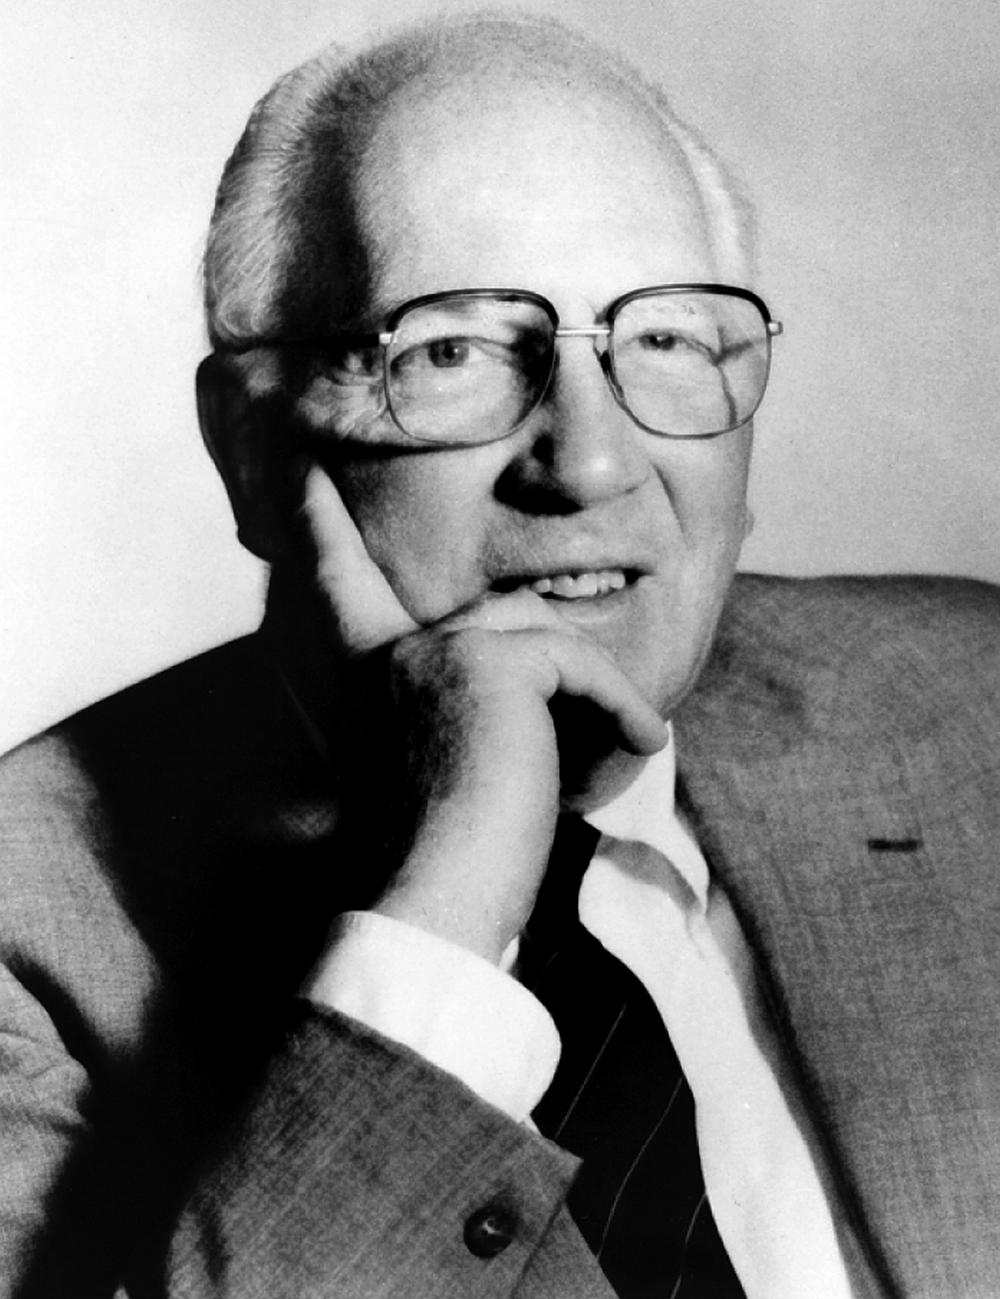 Robert George Culp, Sr.